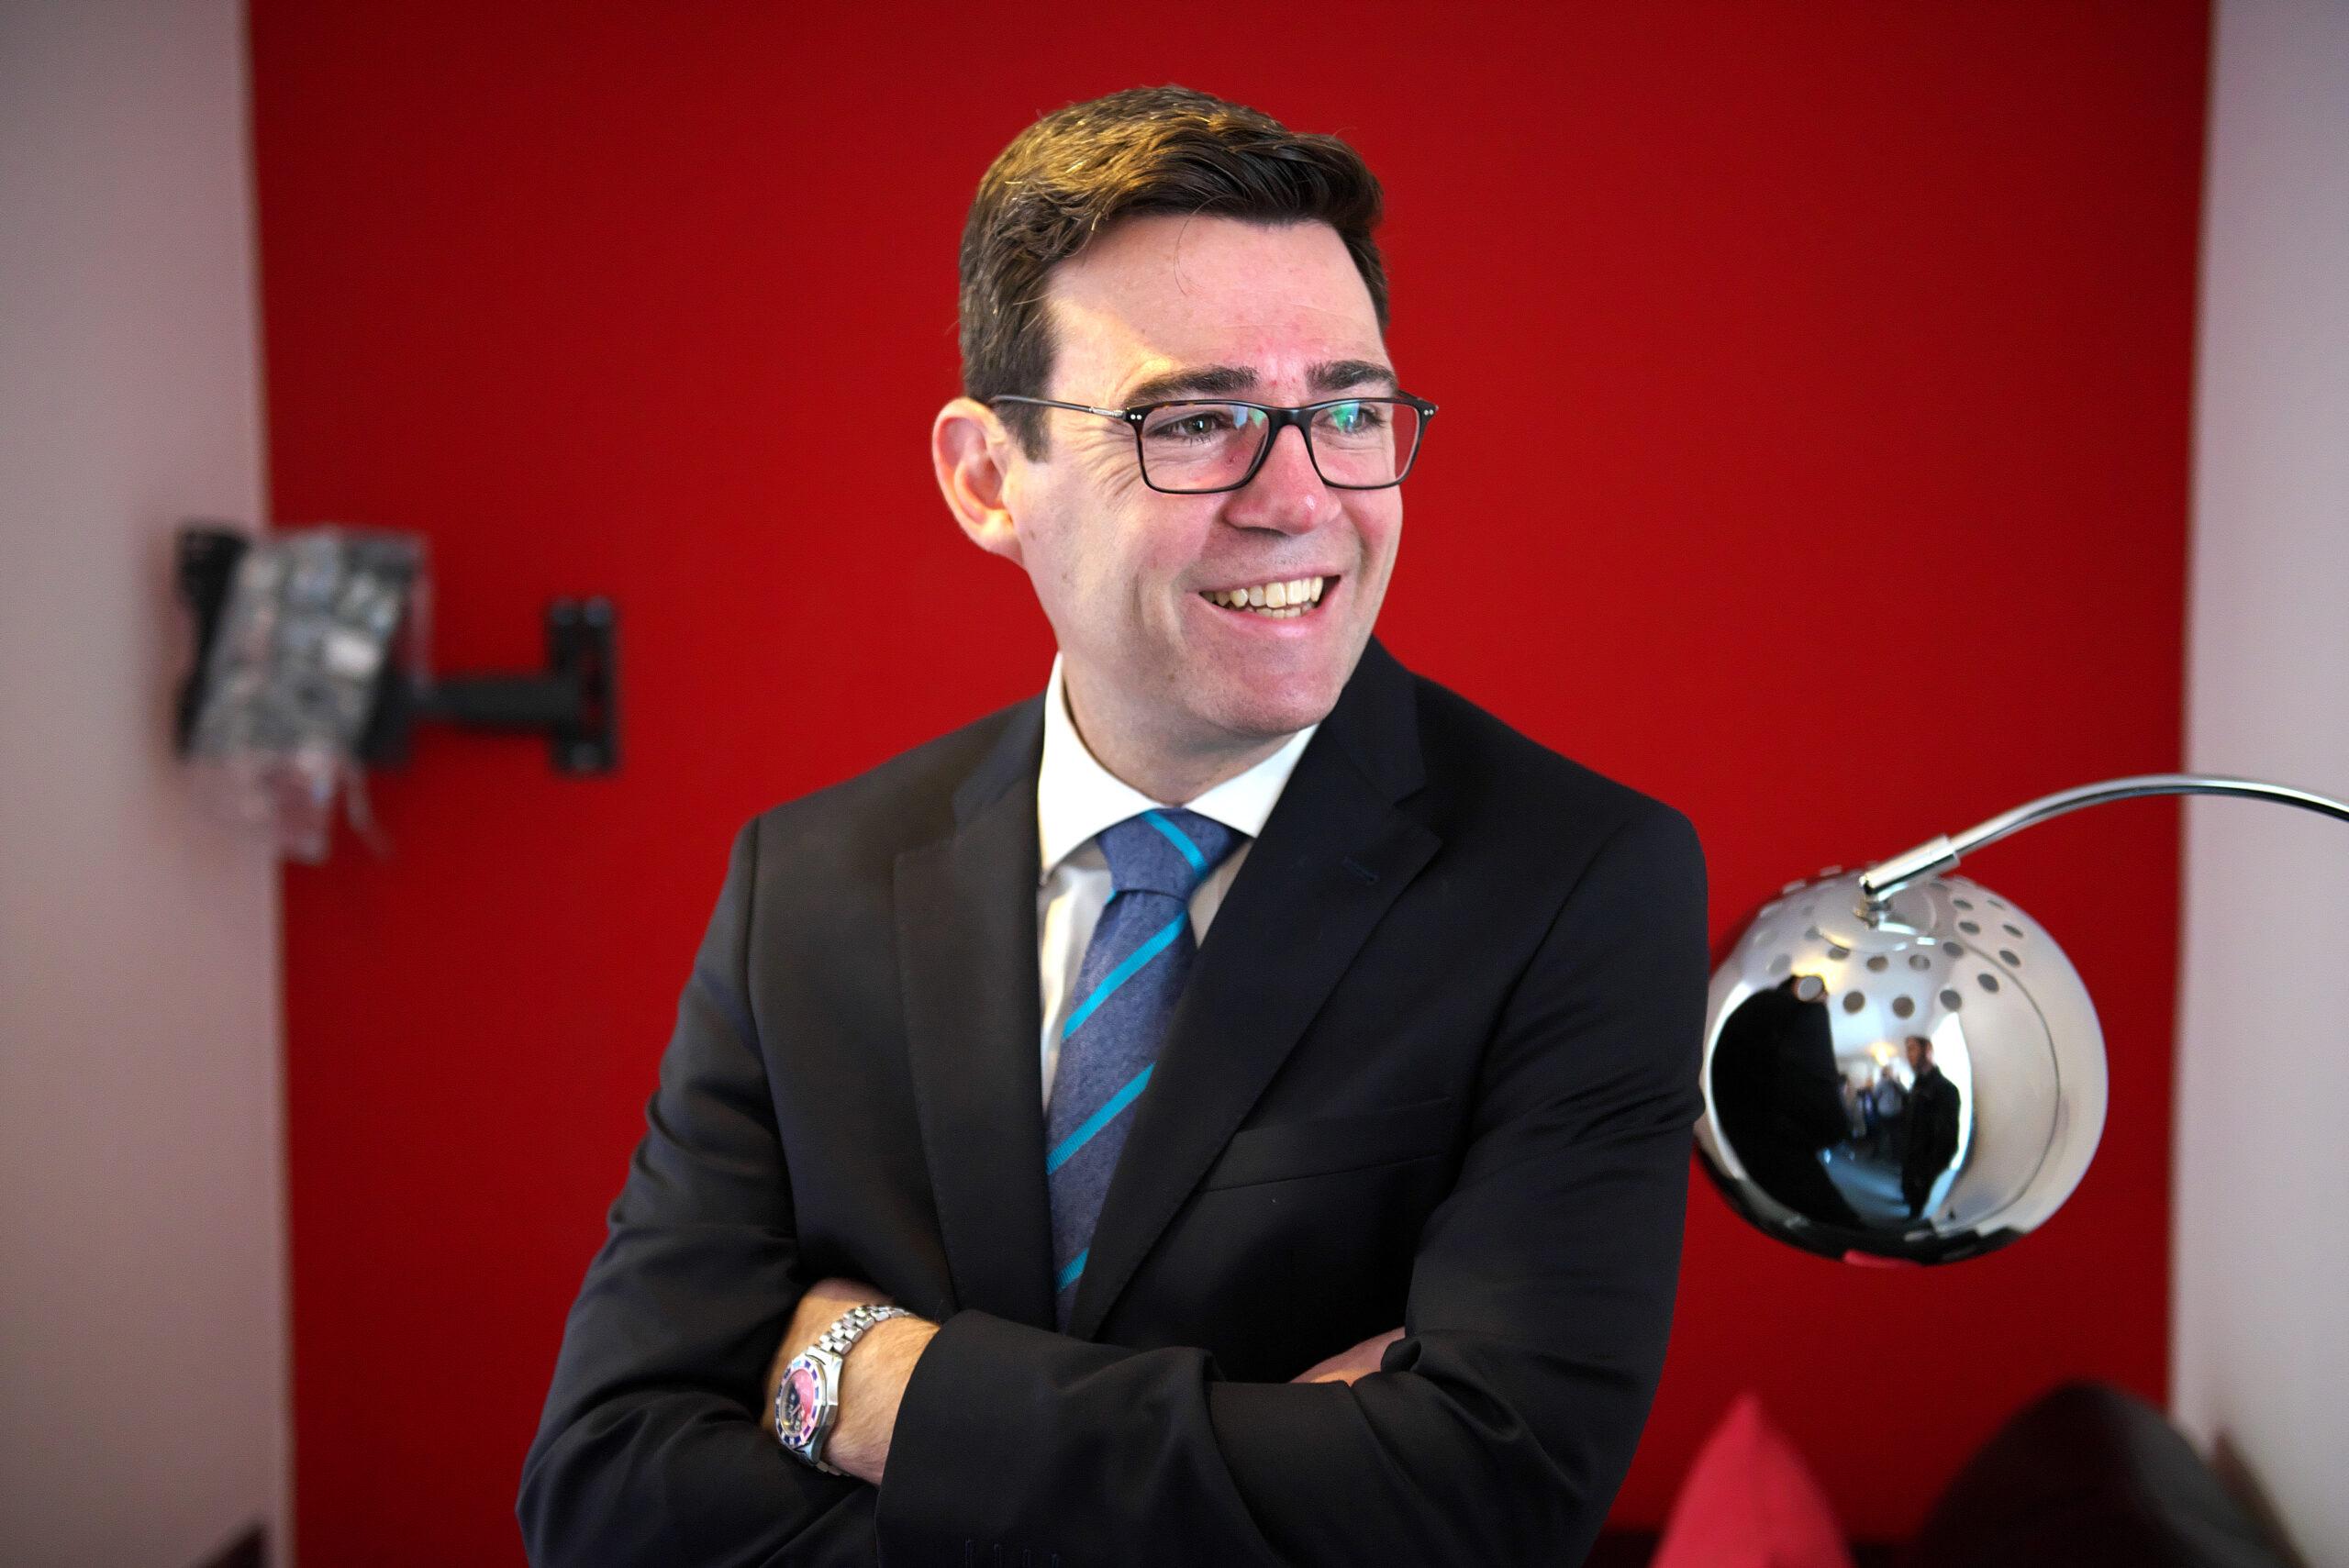 Headshot of Andy Burnham, Mayor of Greater Manchester